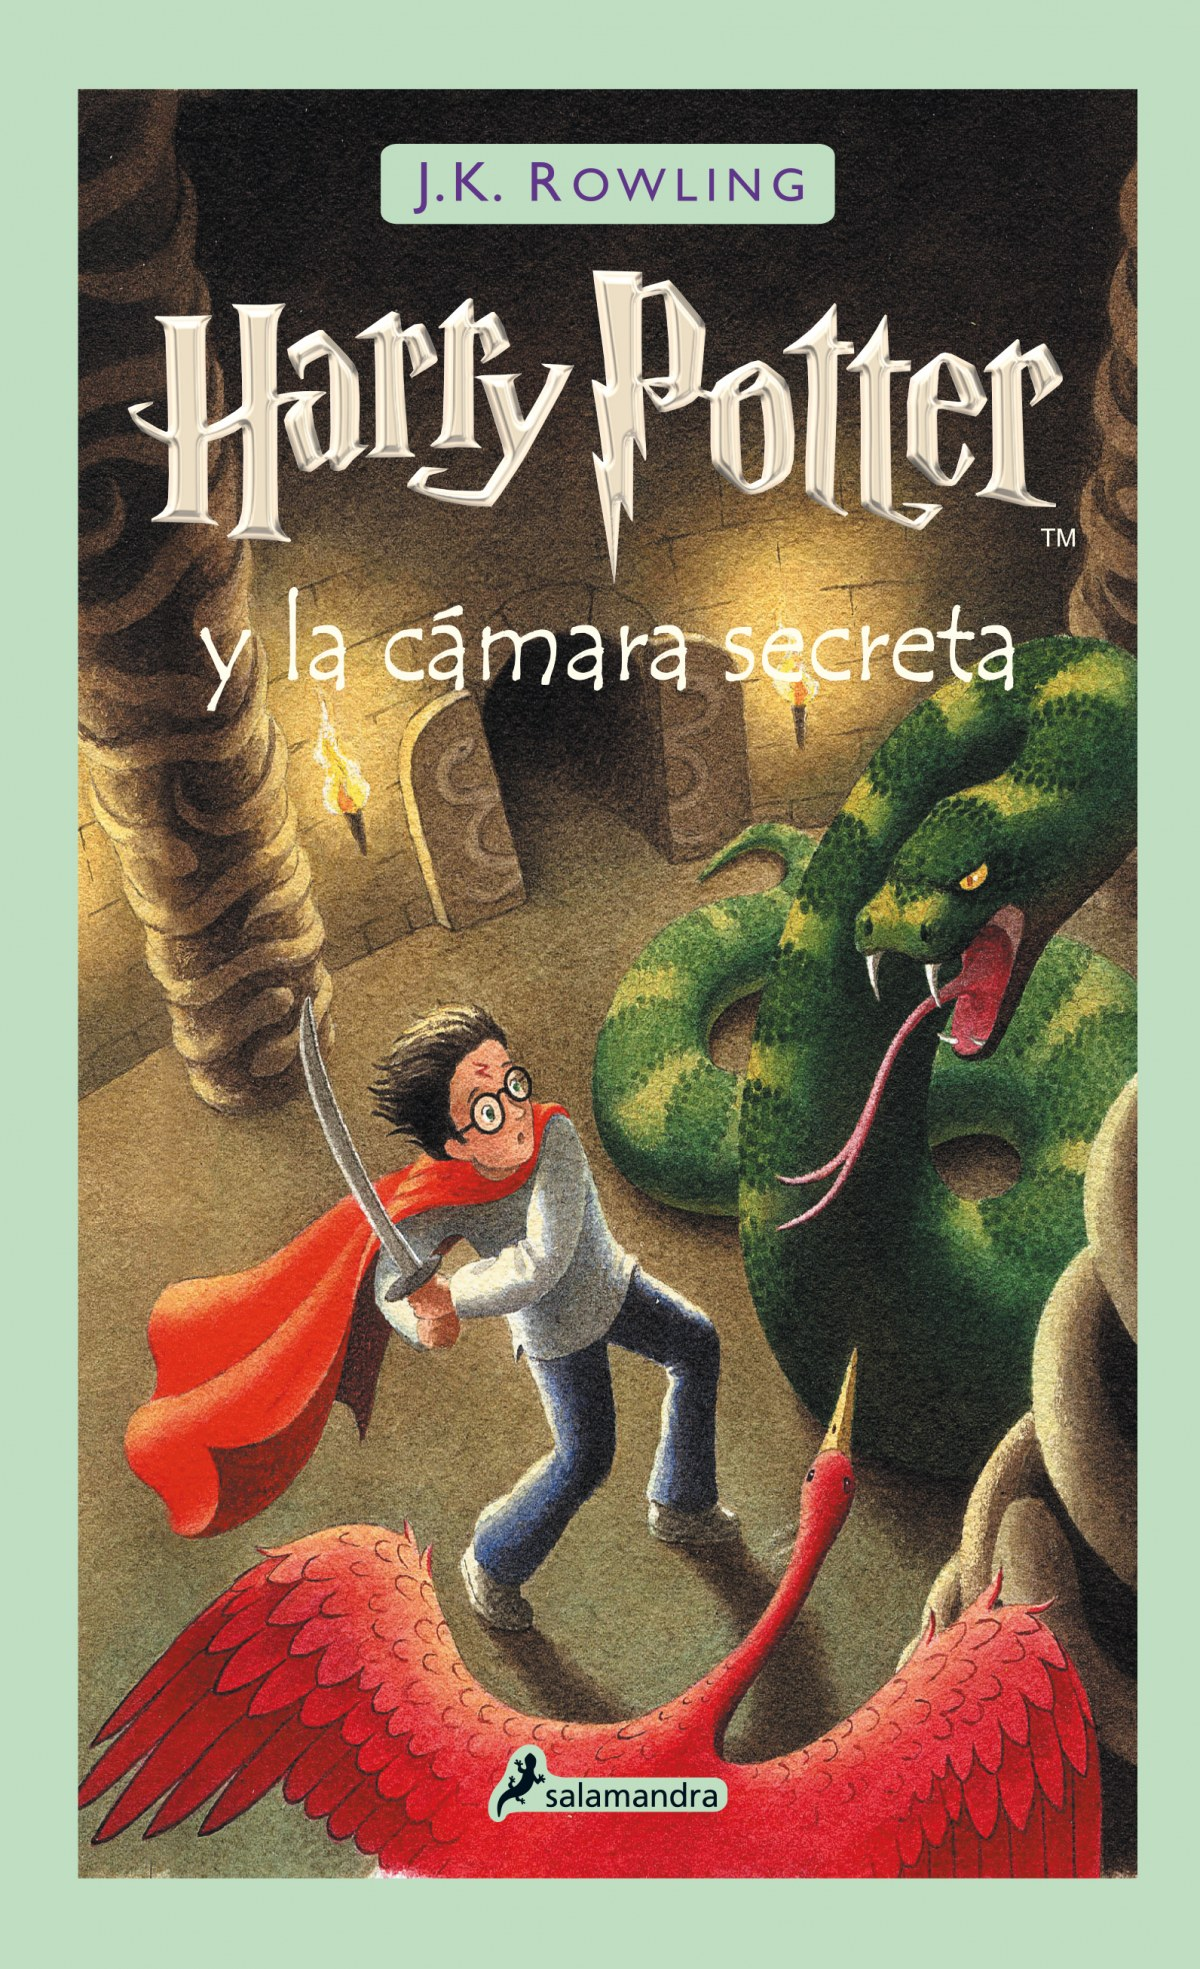 Harry potter y la camara secreta 9788478884957